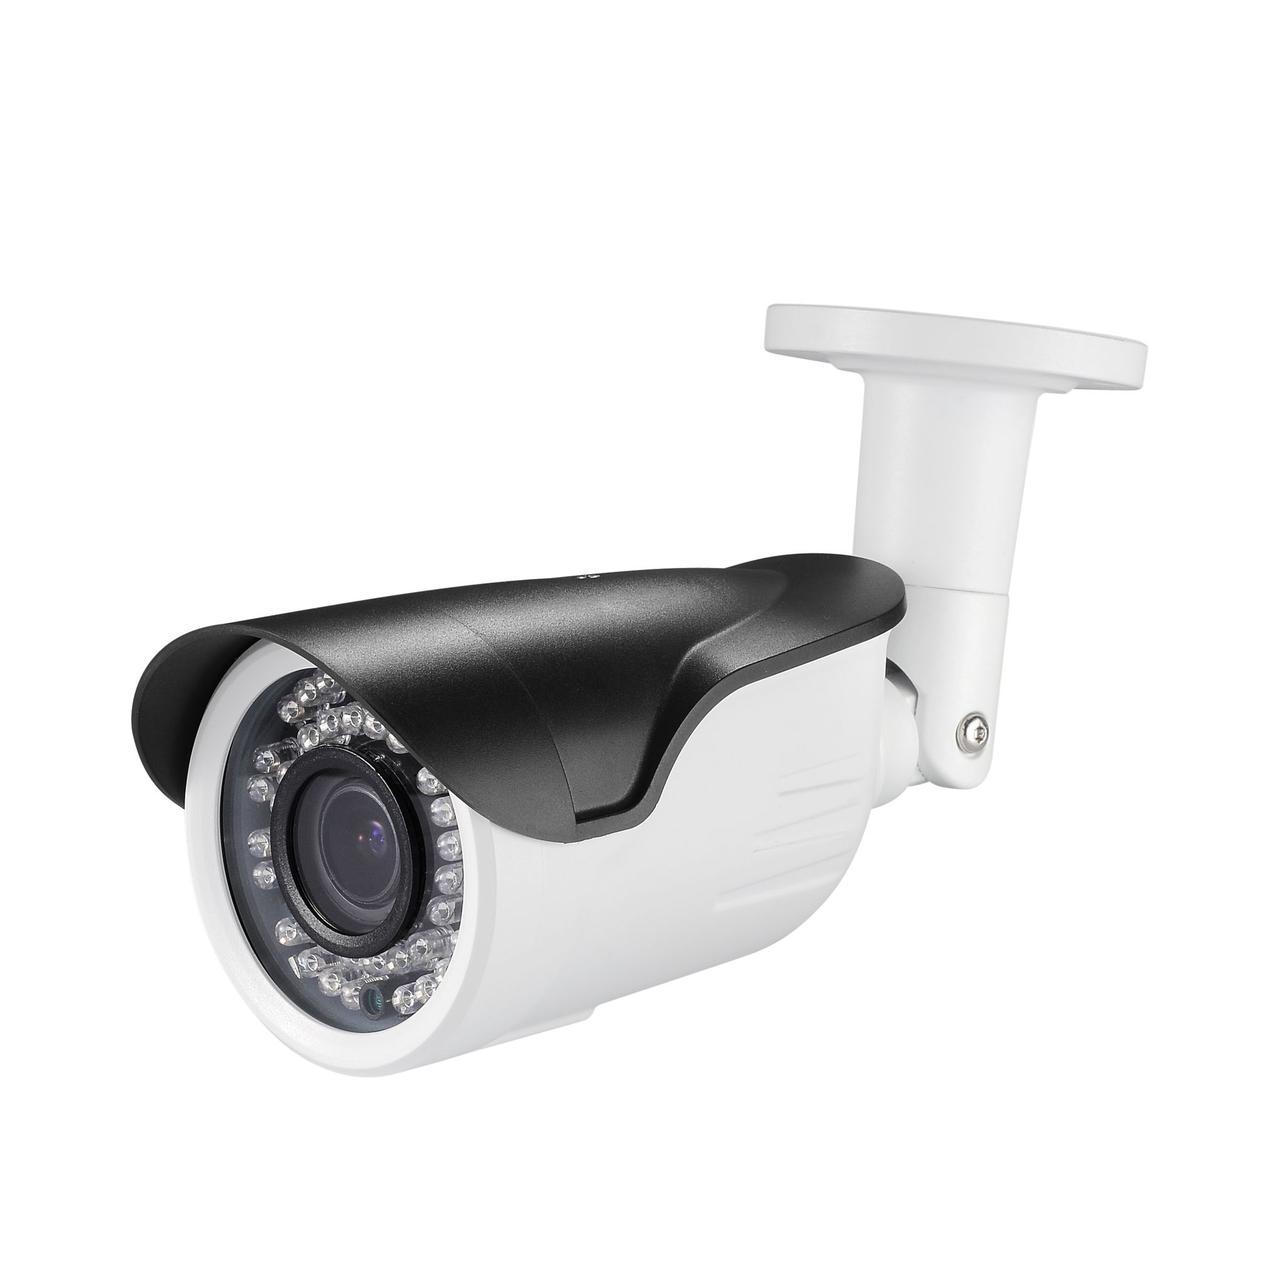 SF-SN343P-J1 Safer уличная 4M IP камера